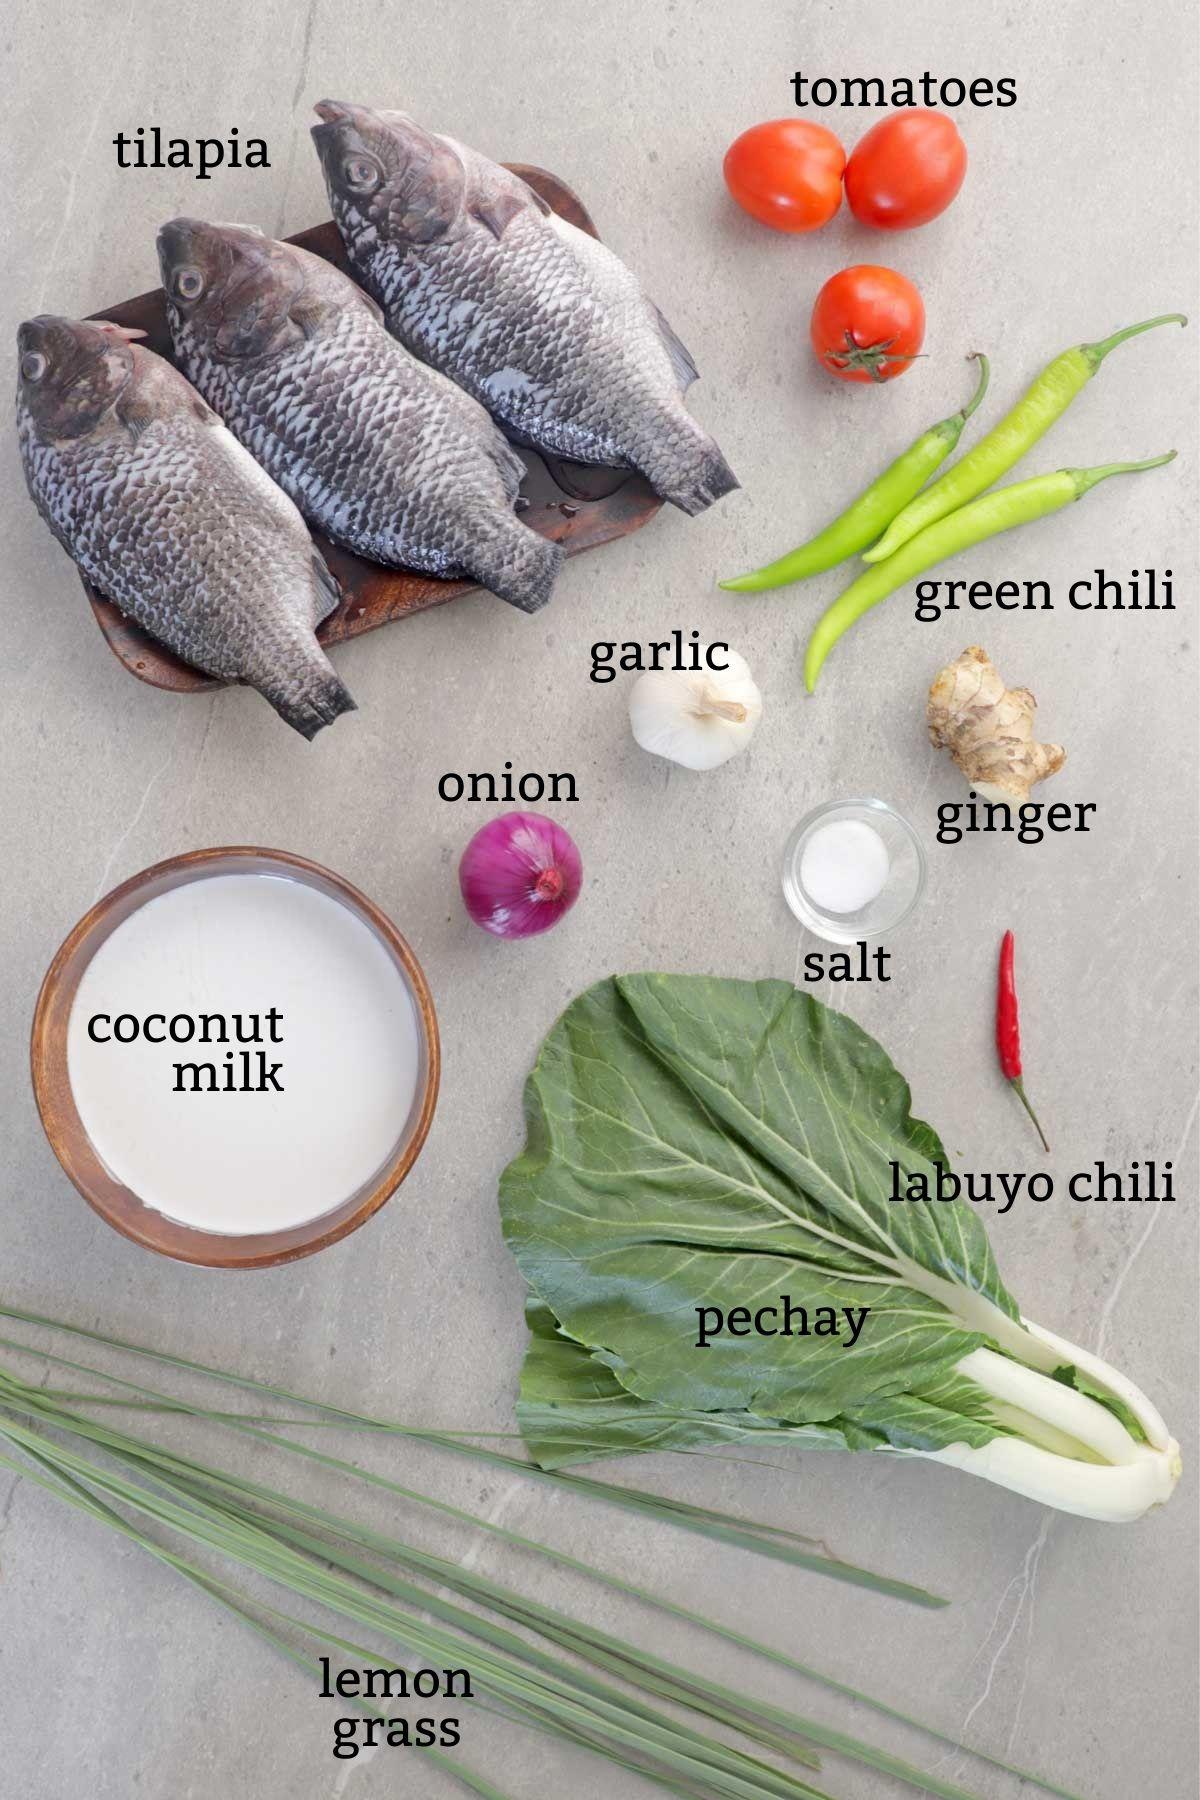 Ingredients for cooking Sinanglay na Tilapia